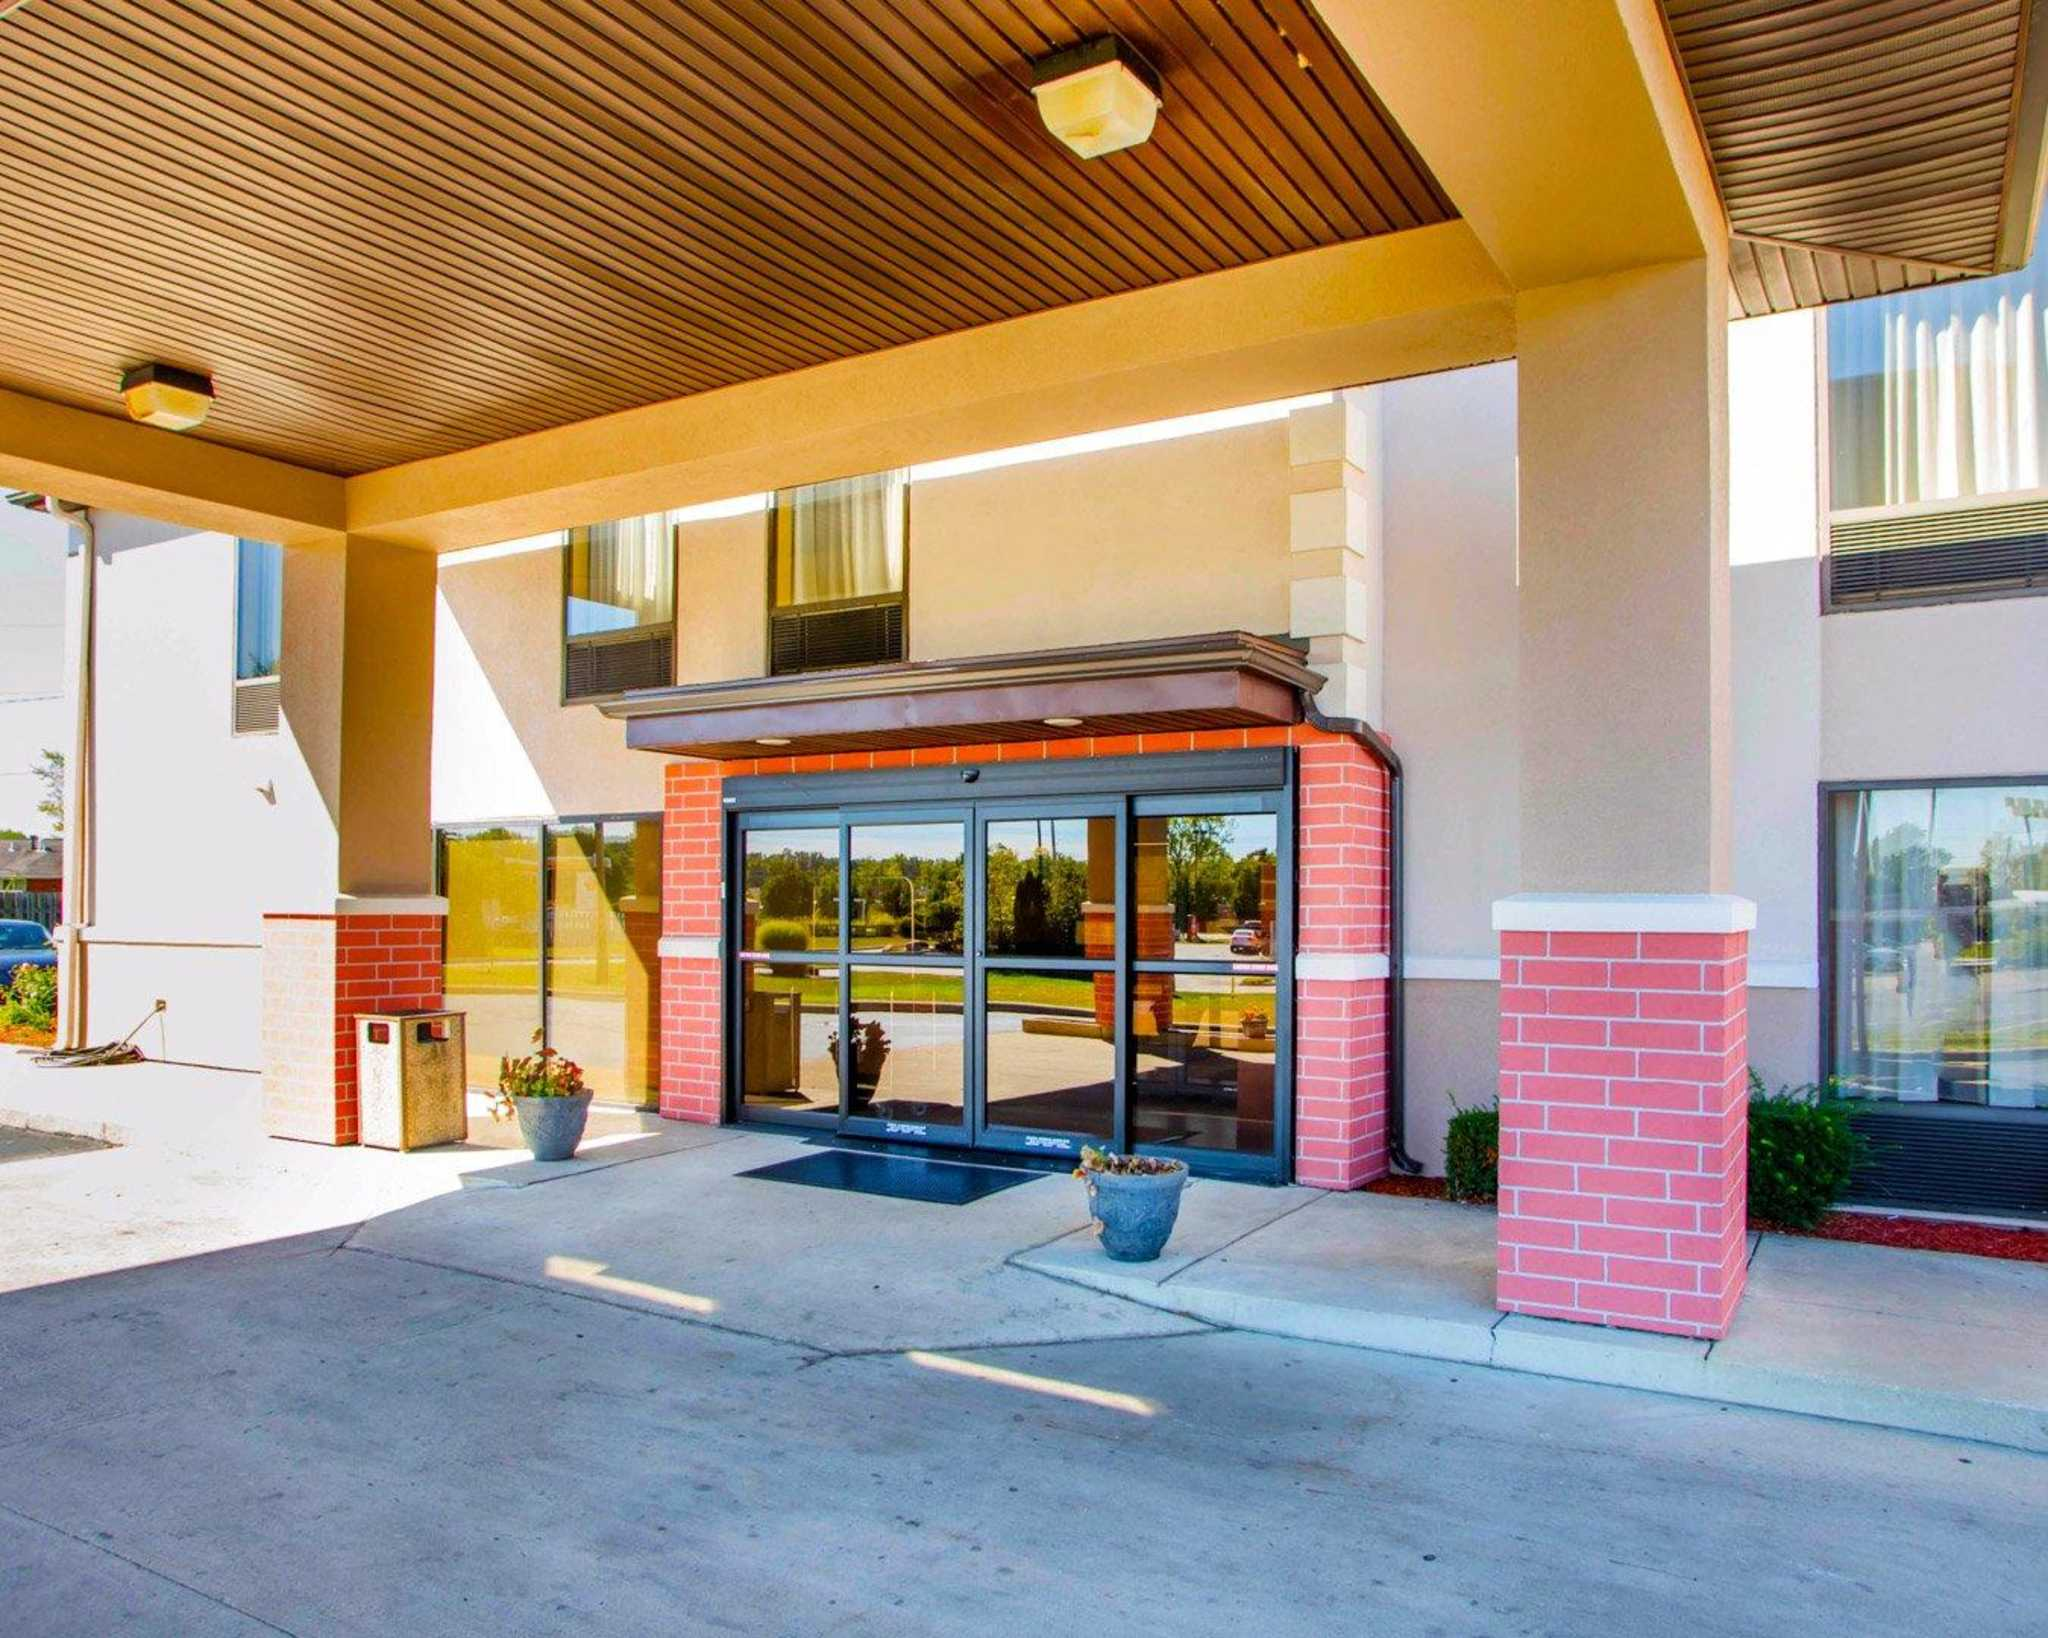 Comfort Inn Dayton - Huber Heights image 4